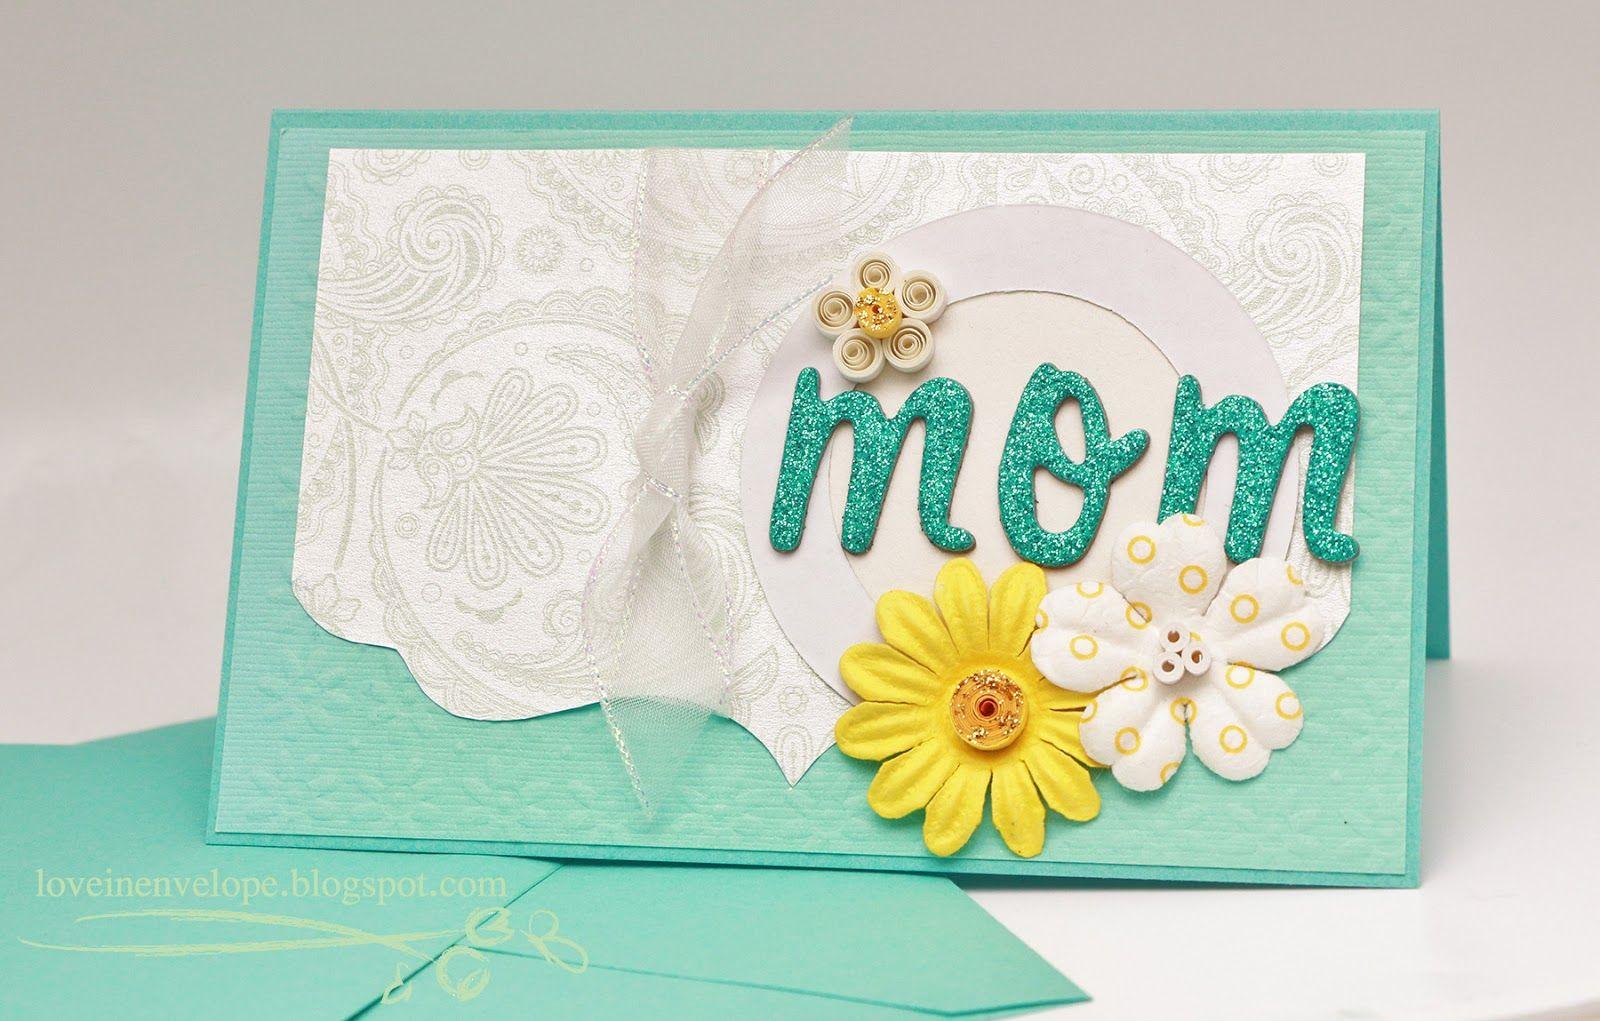 Handmade cards for birthday for mom making birthday